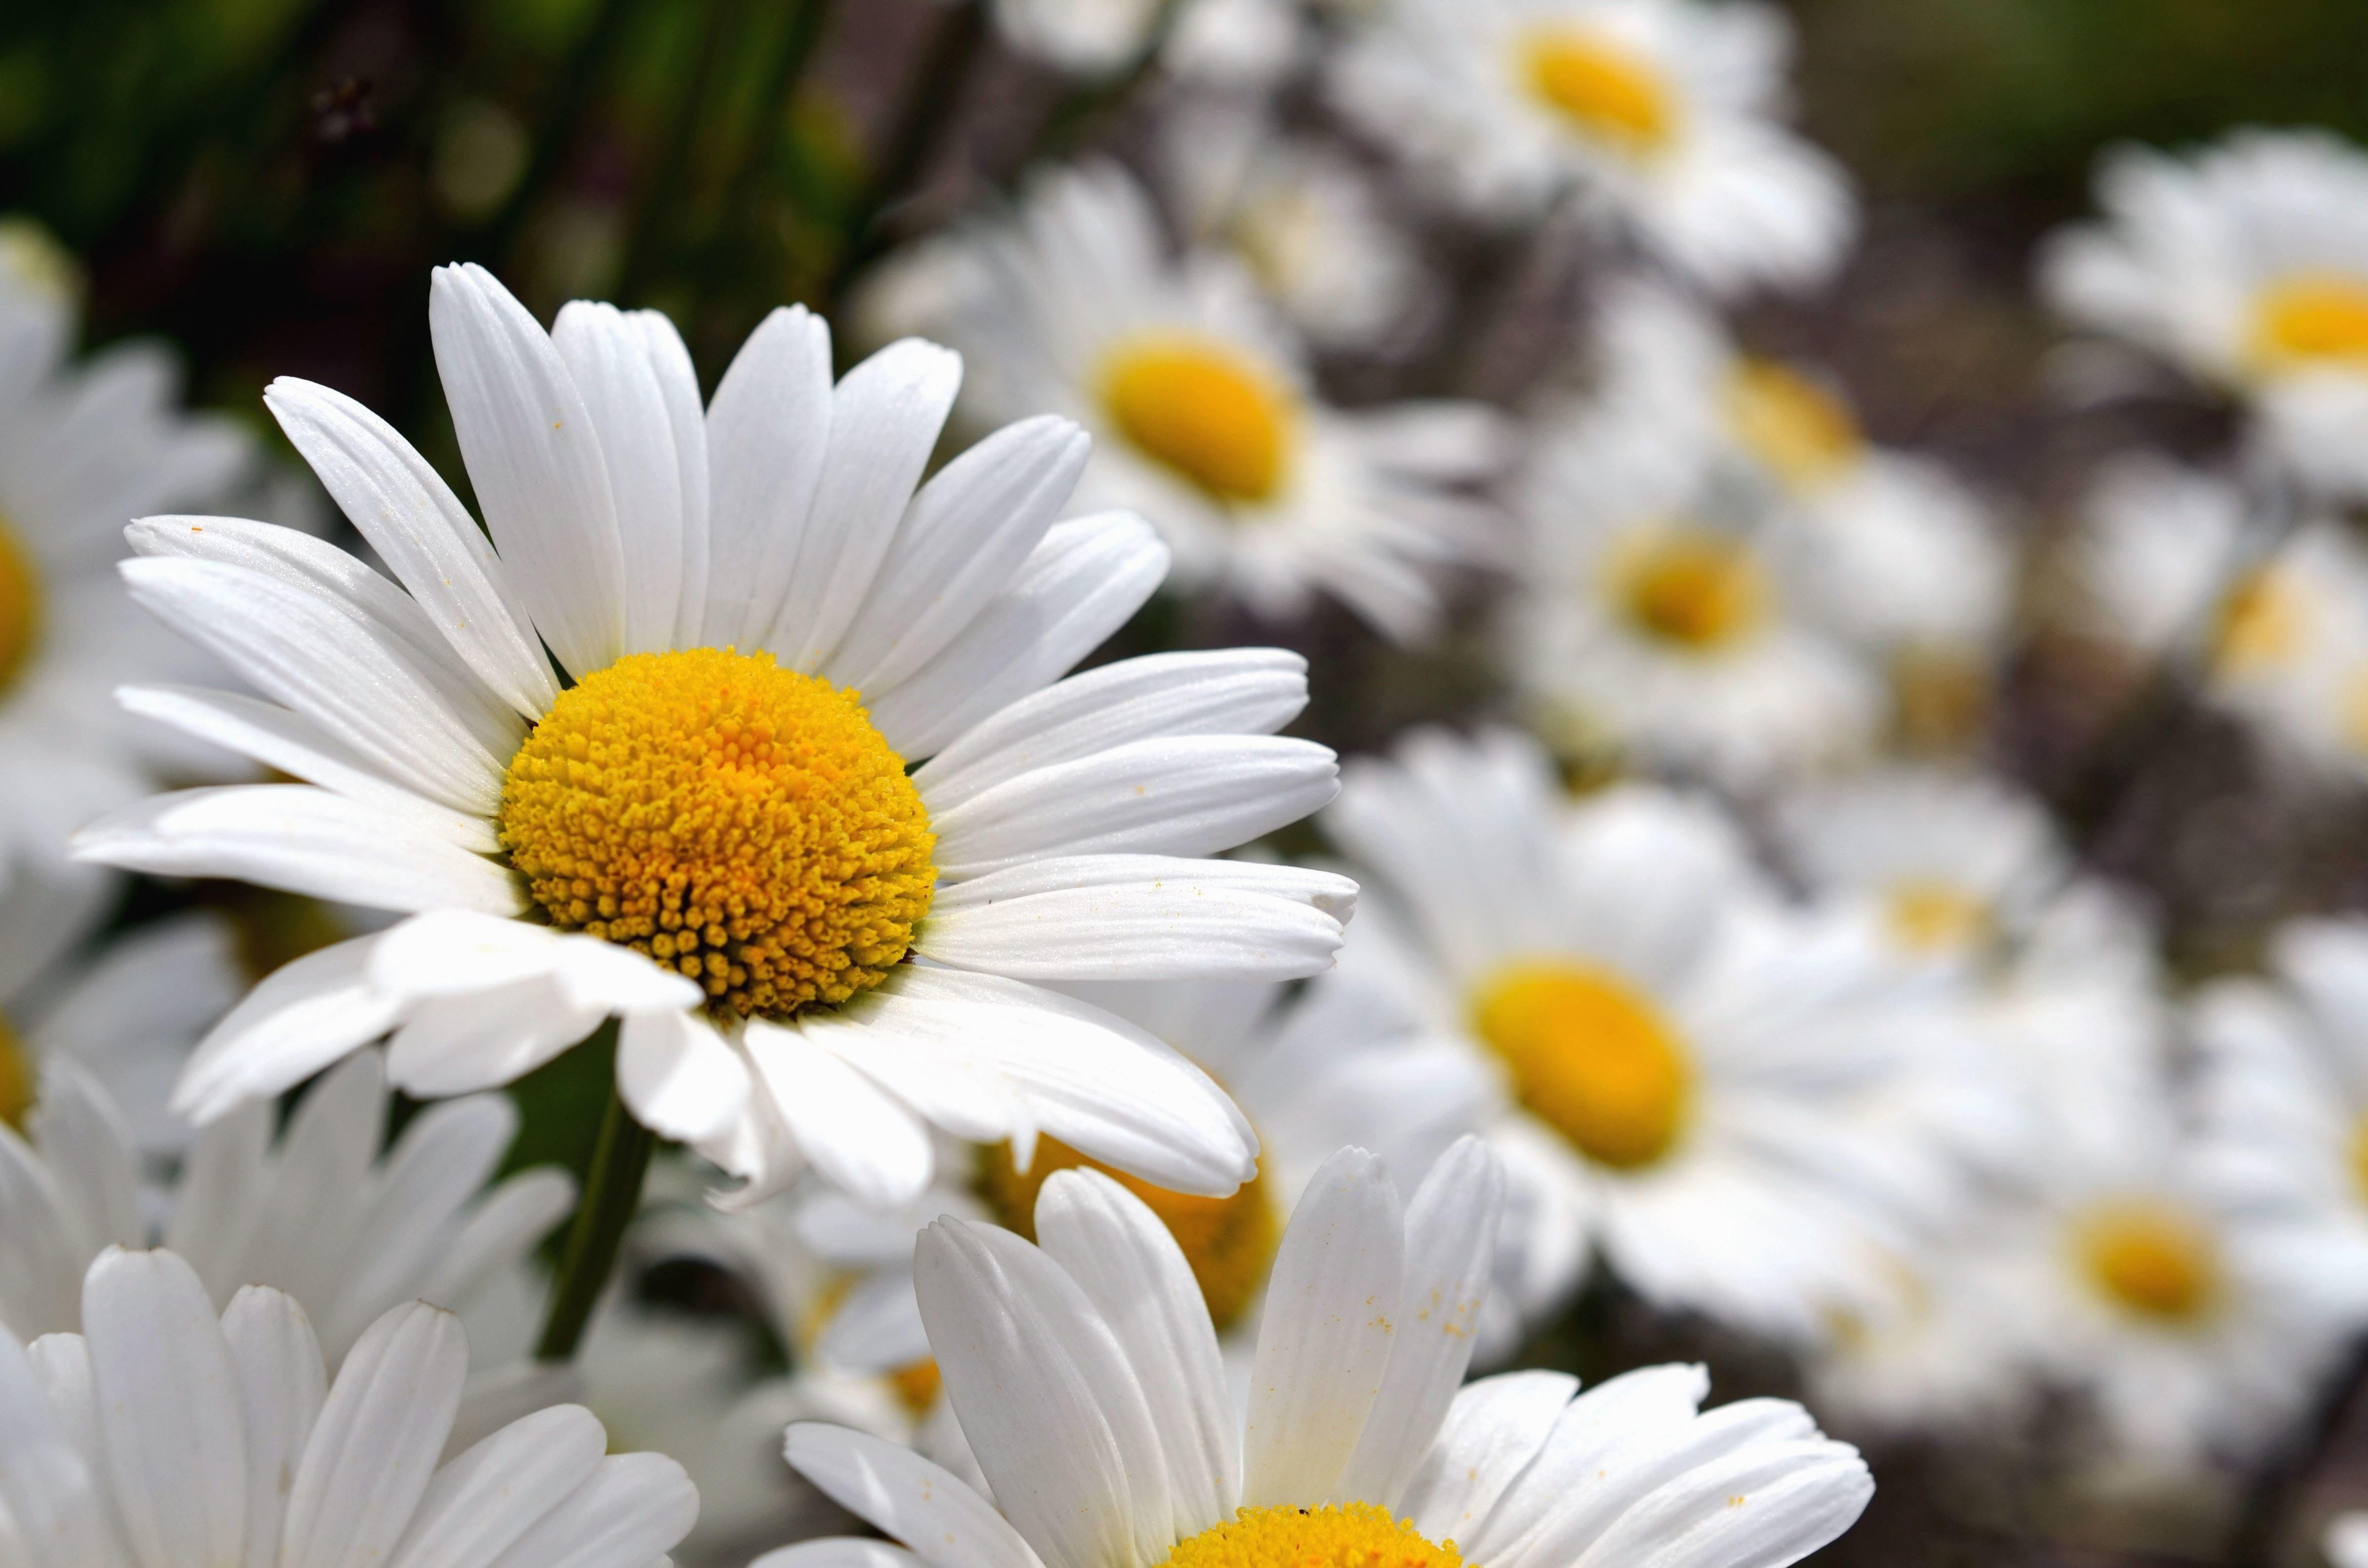 Free Landscape Wallpaper Hd Free Picture Daisy Flowering Petals Pollen Stamens